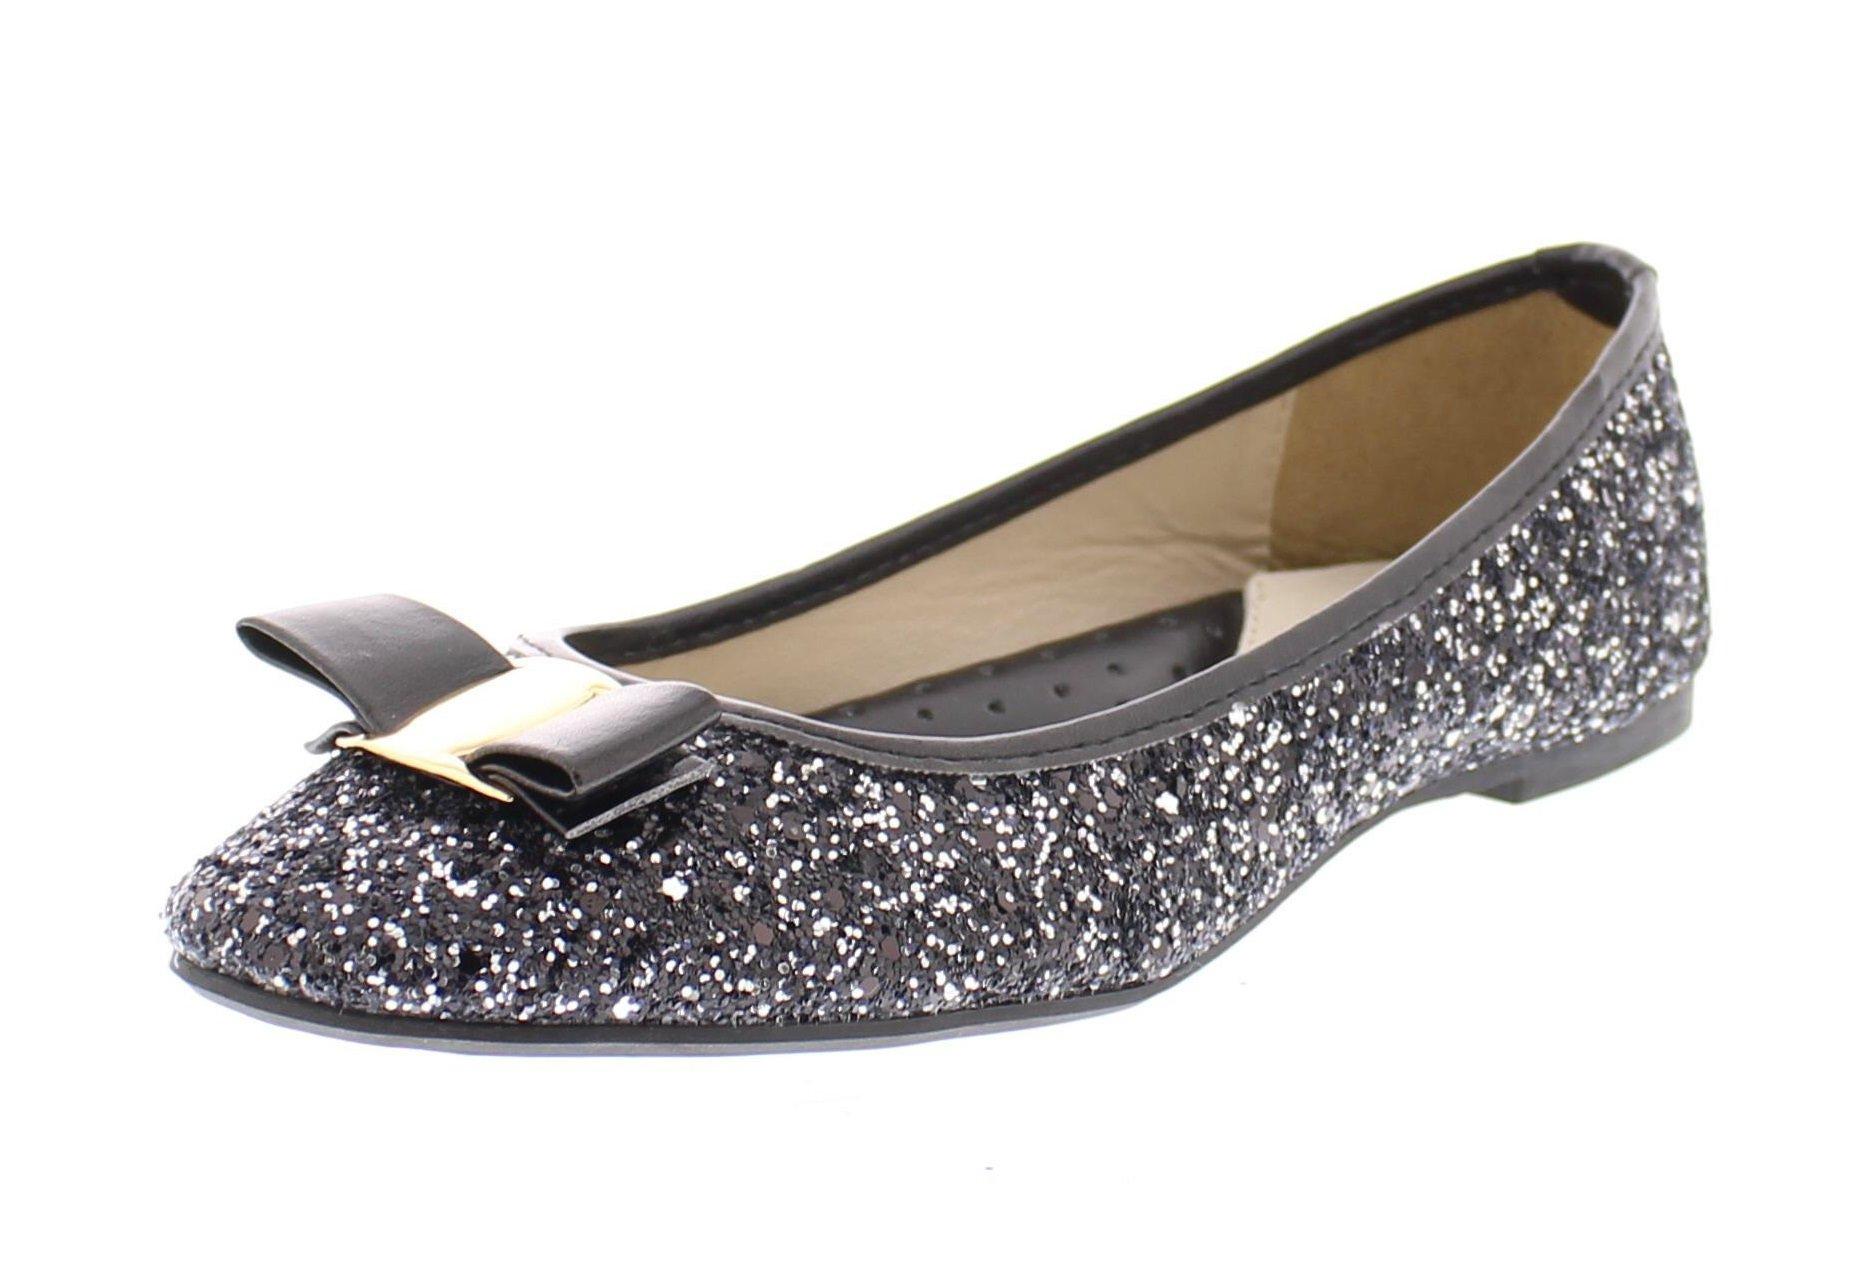 Gold Toe Women's Tempest Metallic Sequin Sparkle Ballet Flat Slipon Dress Pump Bow Ballerina Skimmer Shoe Black 11 US